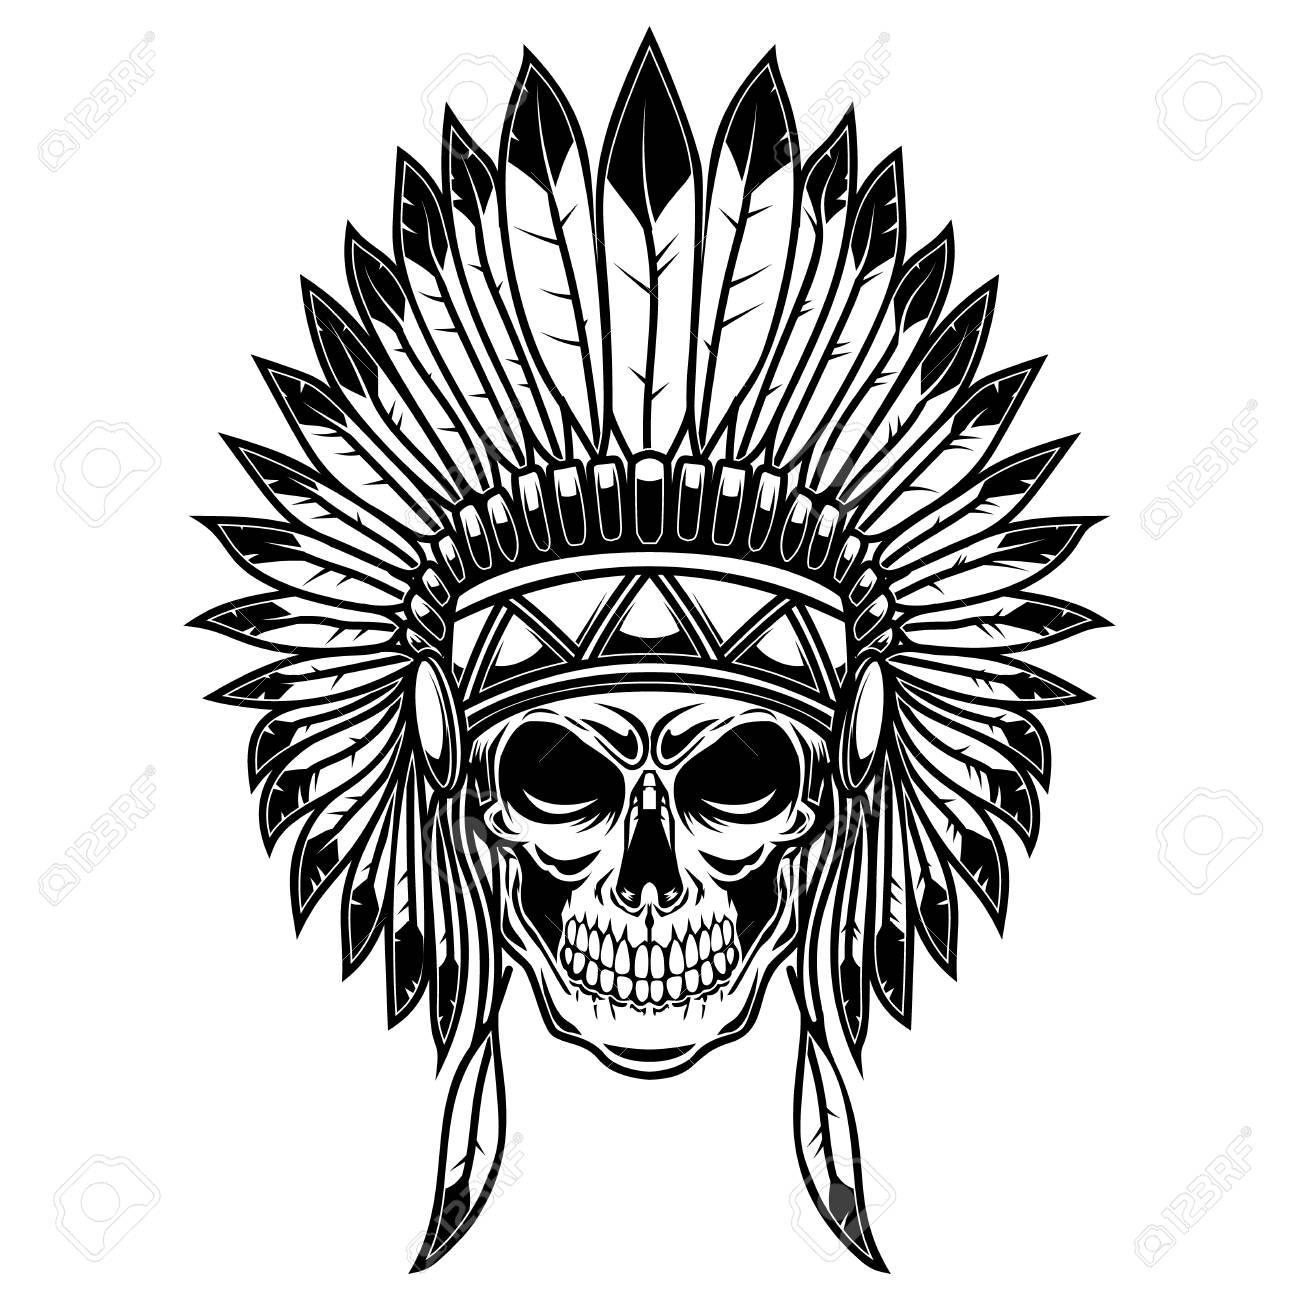 Skull in native american indians headdress. Design element for poster, card, banner, sign, t shirt. Vector illustration - 127143454